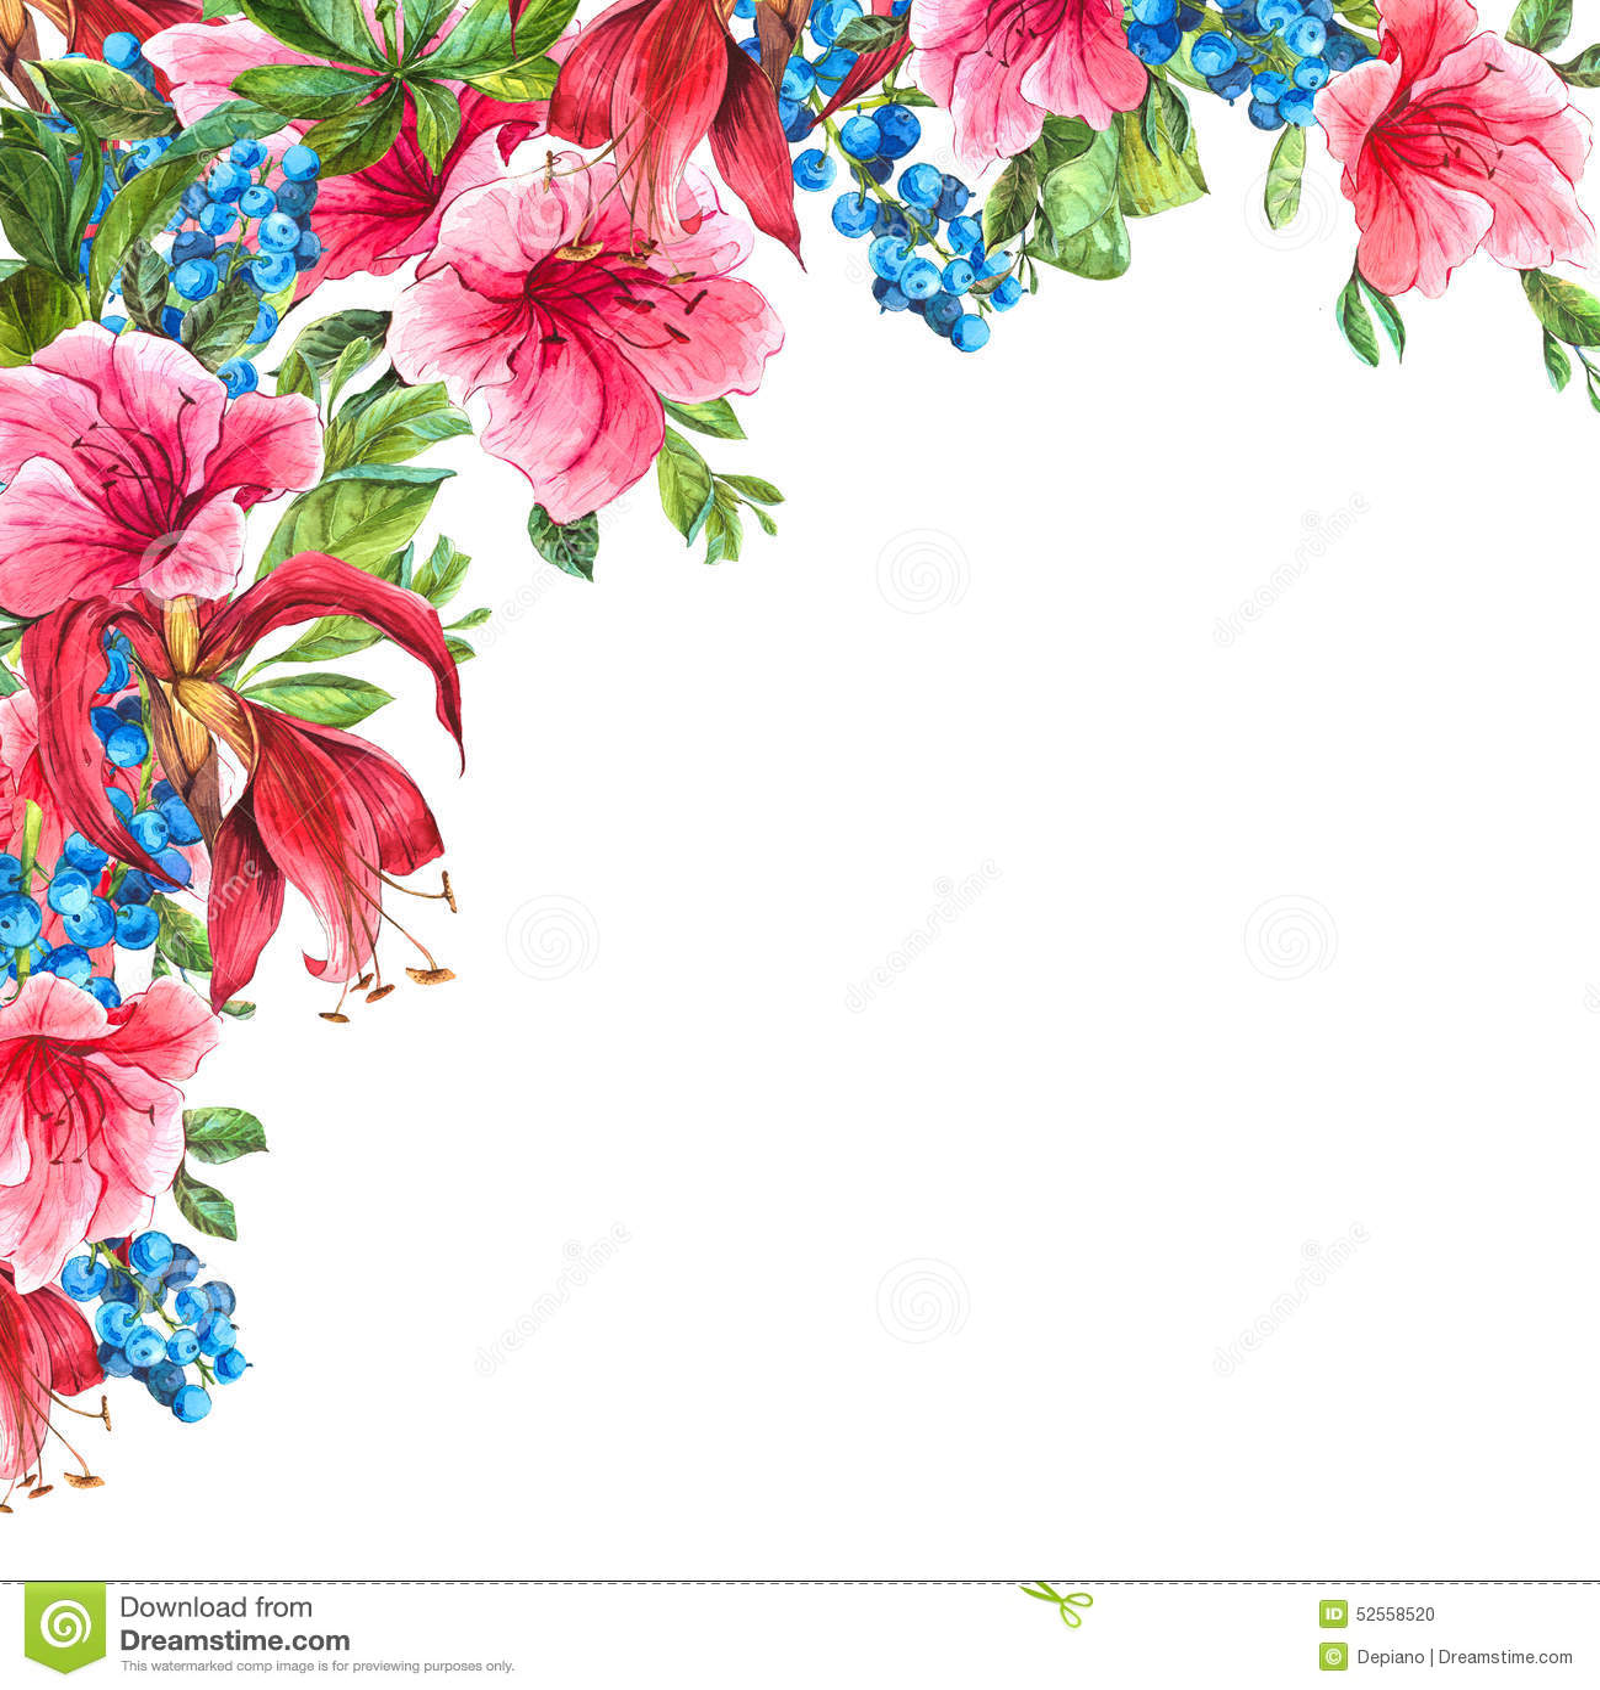 Art De La Fleur - Home Facebook